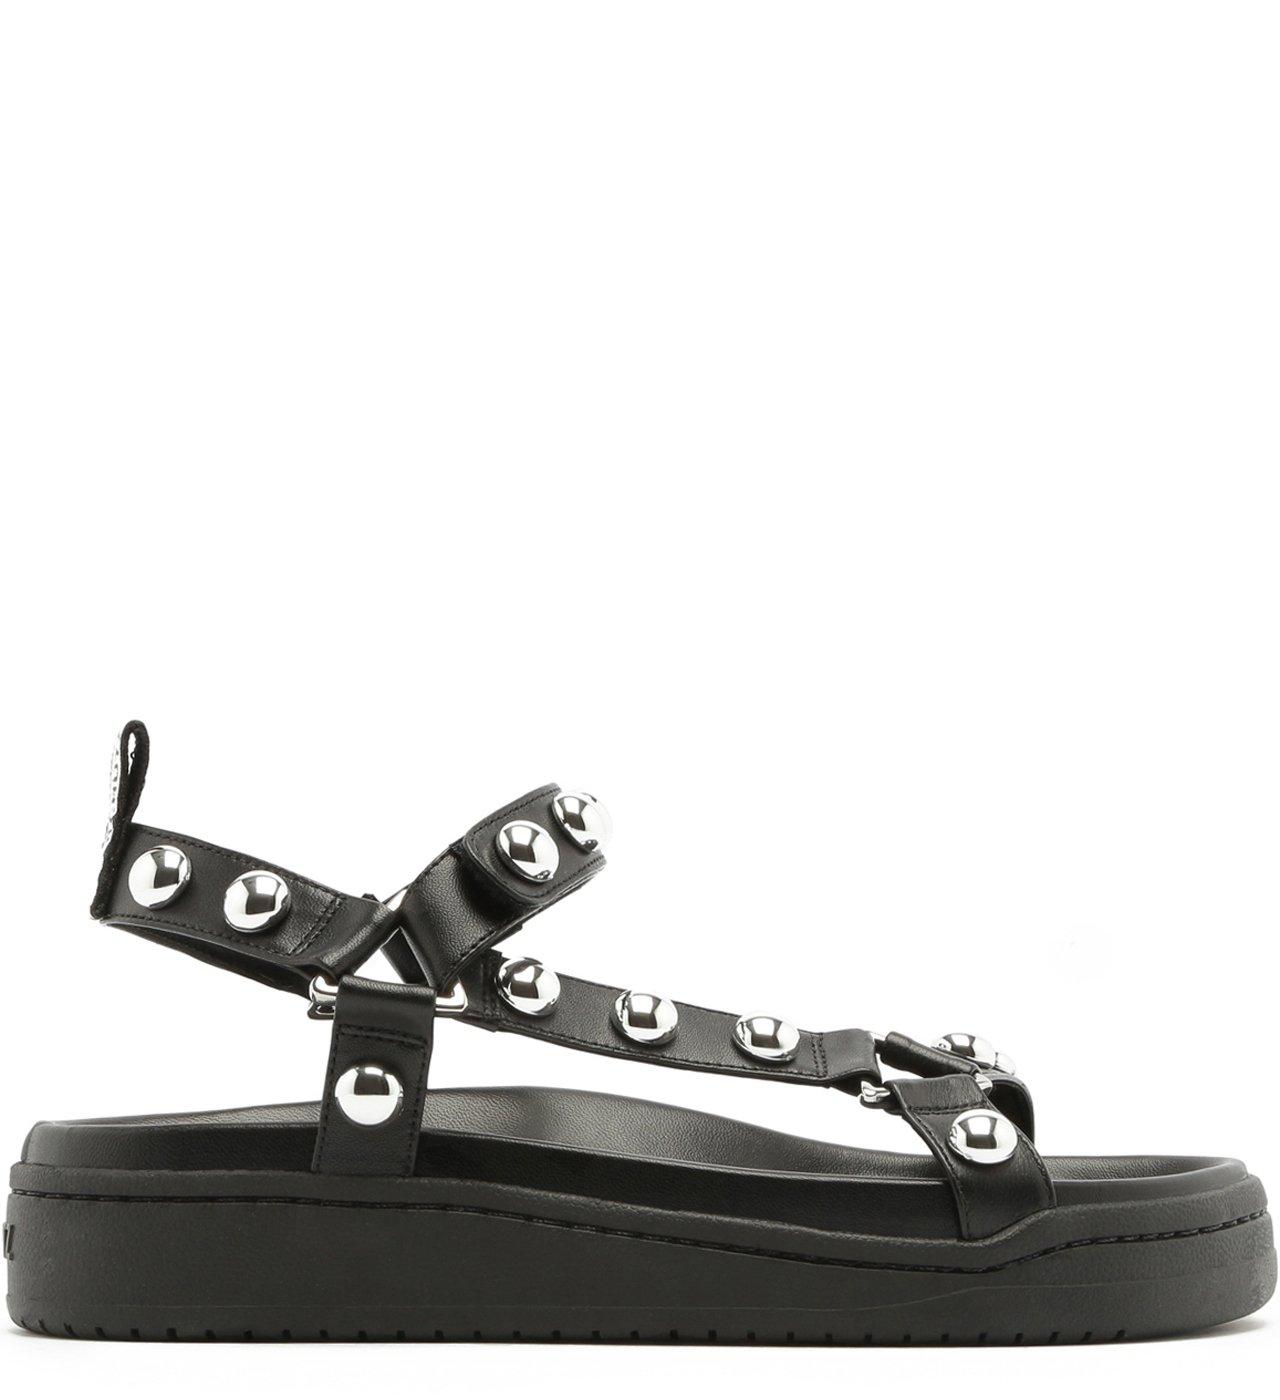 Sporty Sandal Studs Black | Schutz